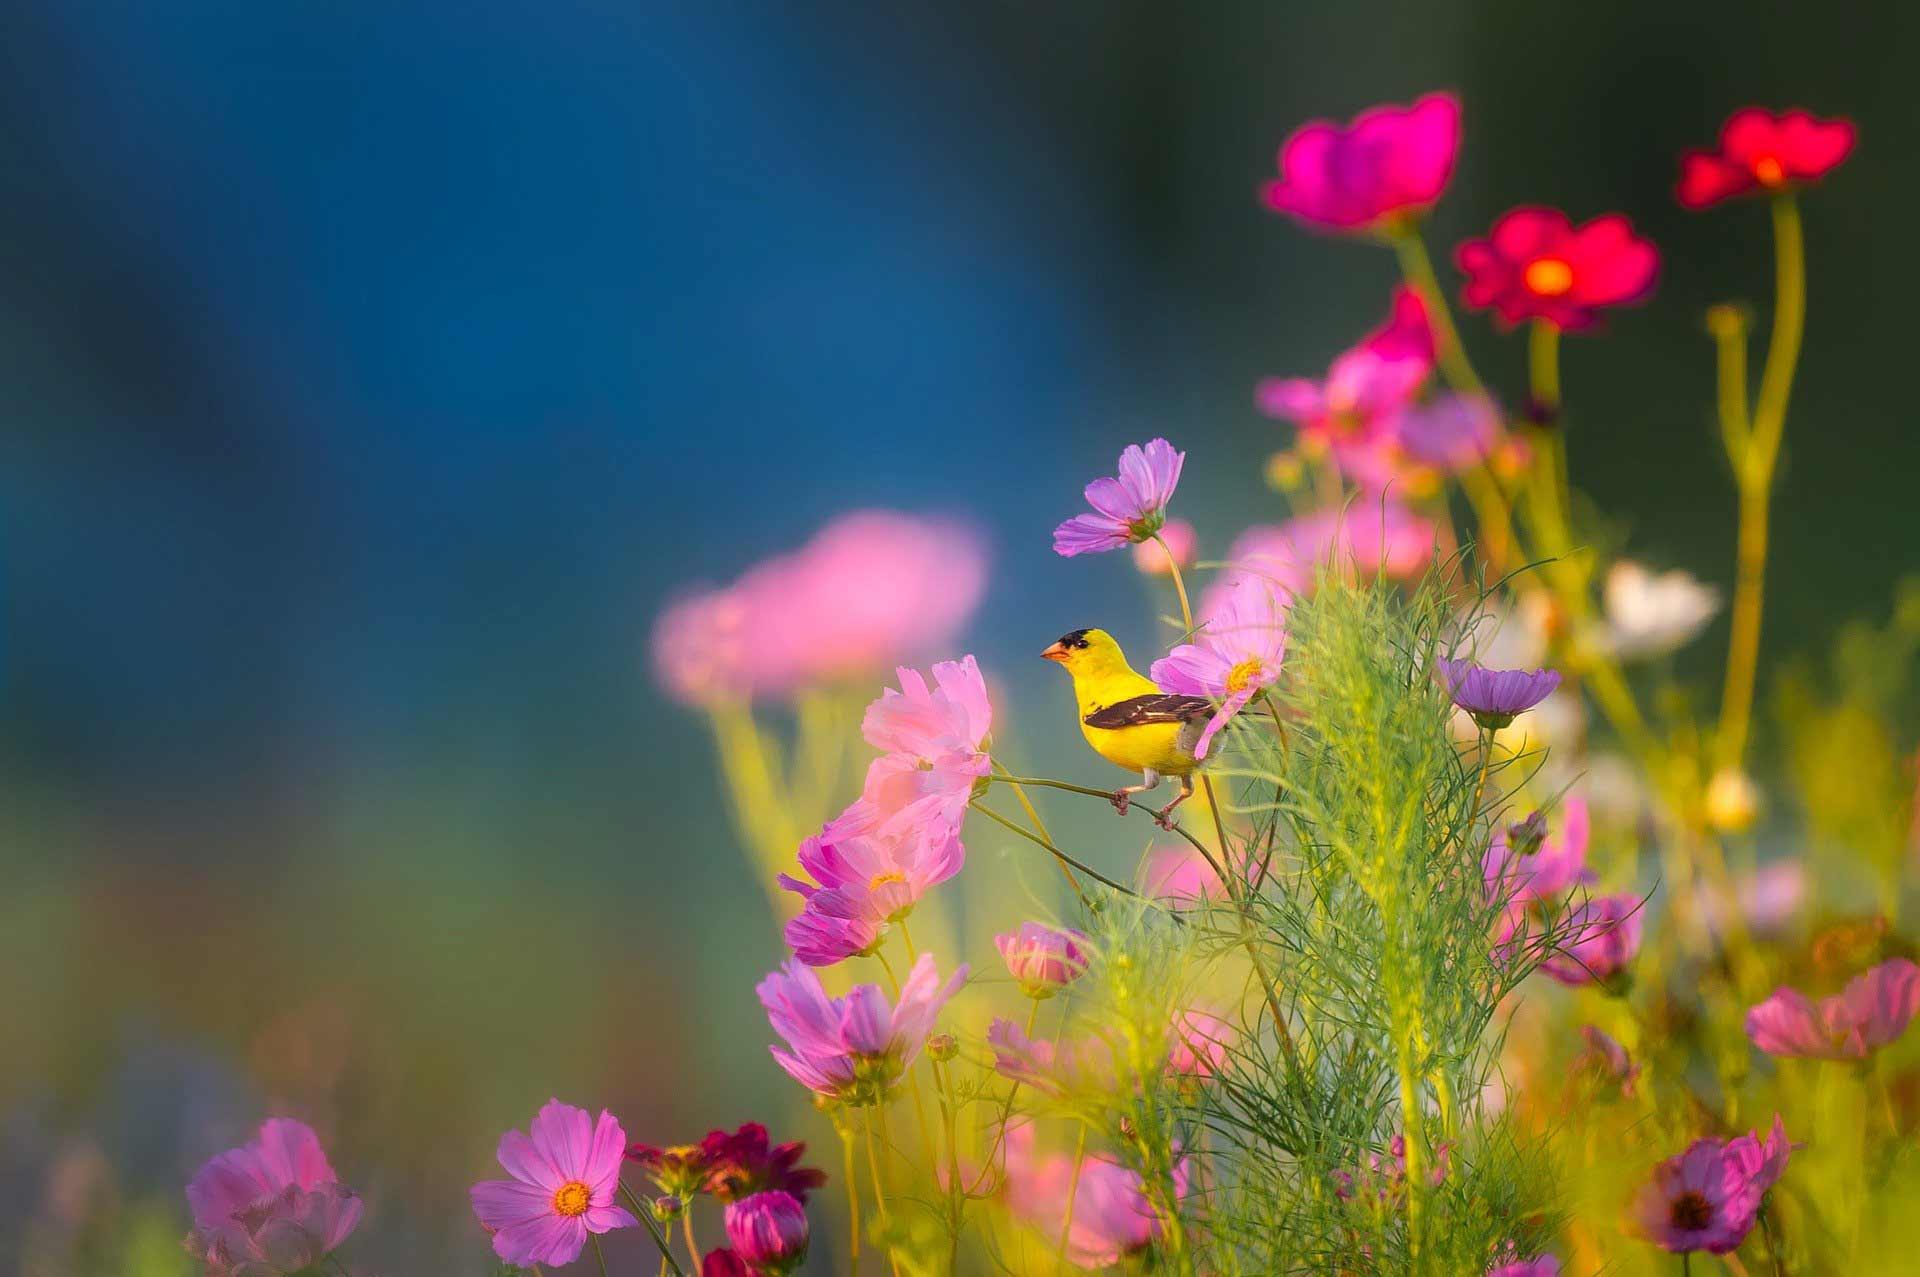 International Day for Biological Diversity - flowers